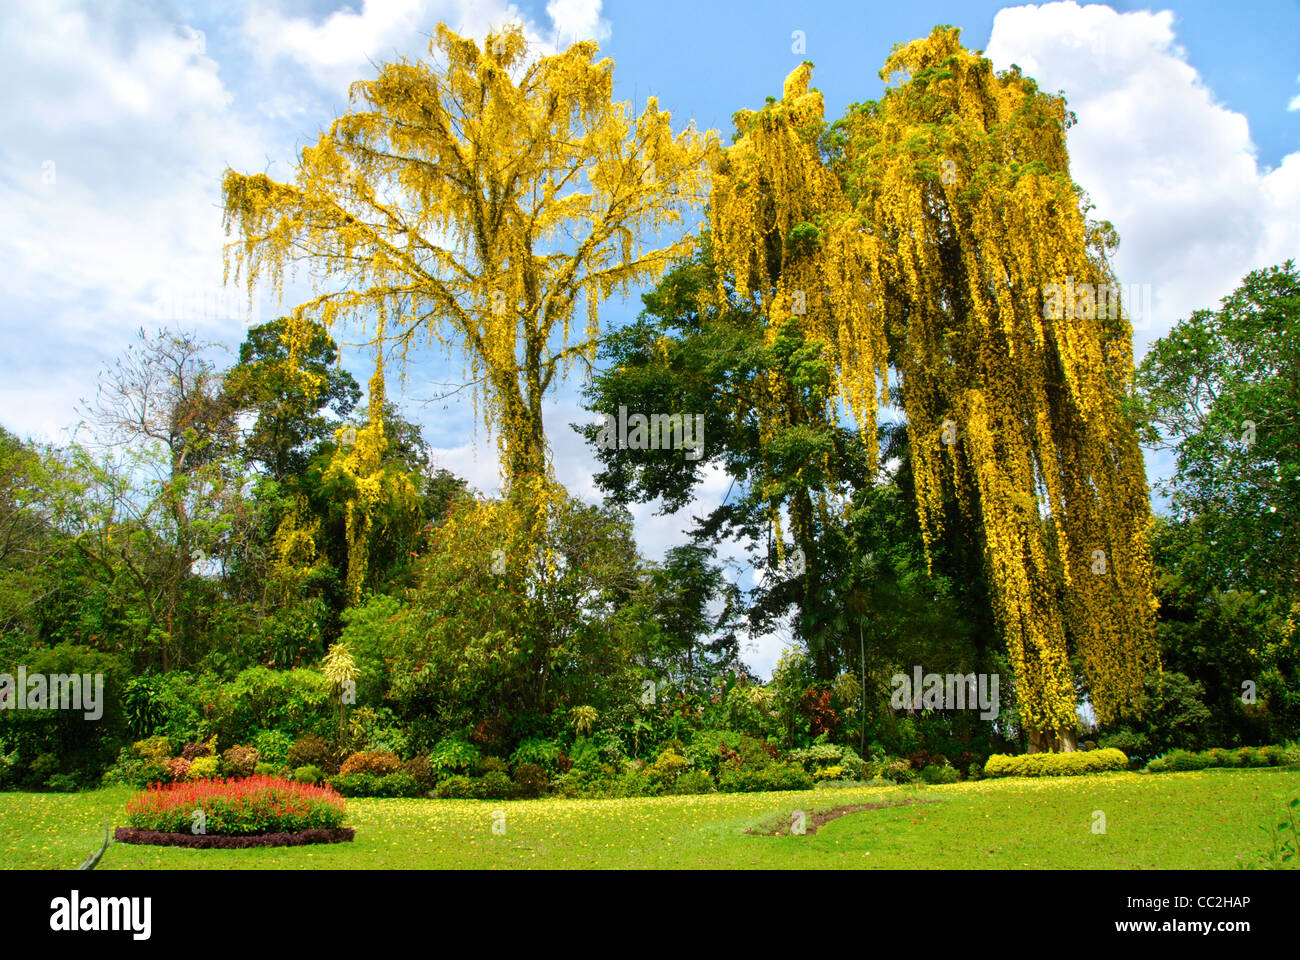 royal peradeniya botanical gardens near kandy sri lanka the park is stock photo royalty free